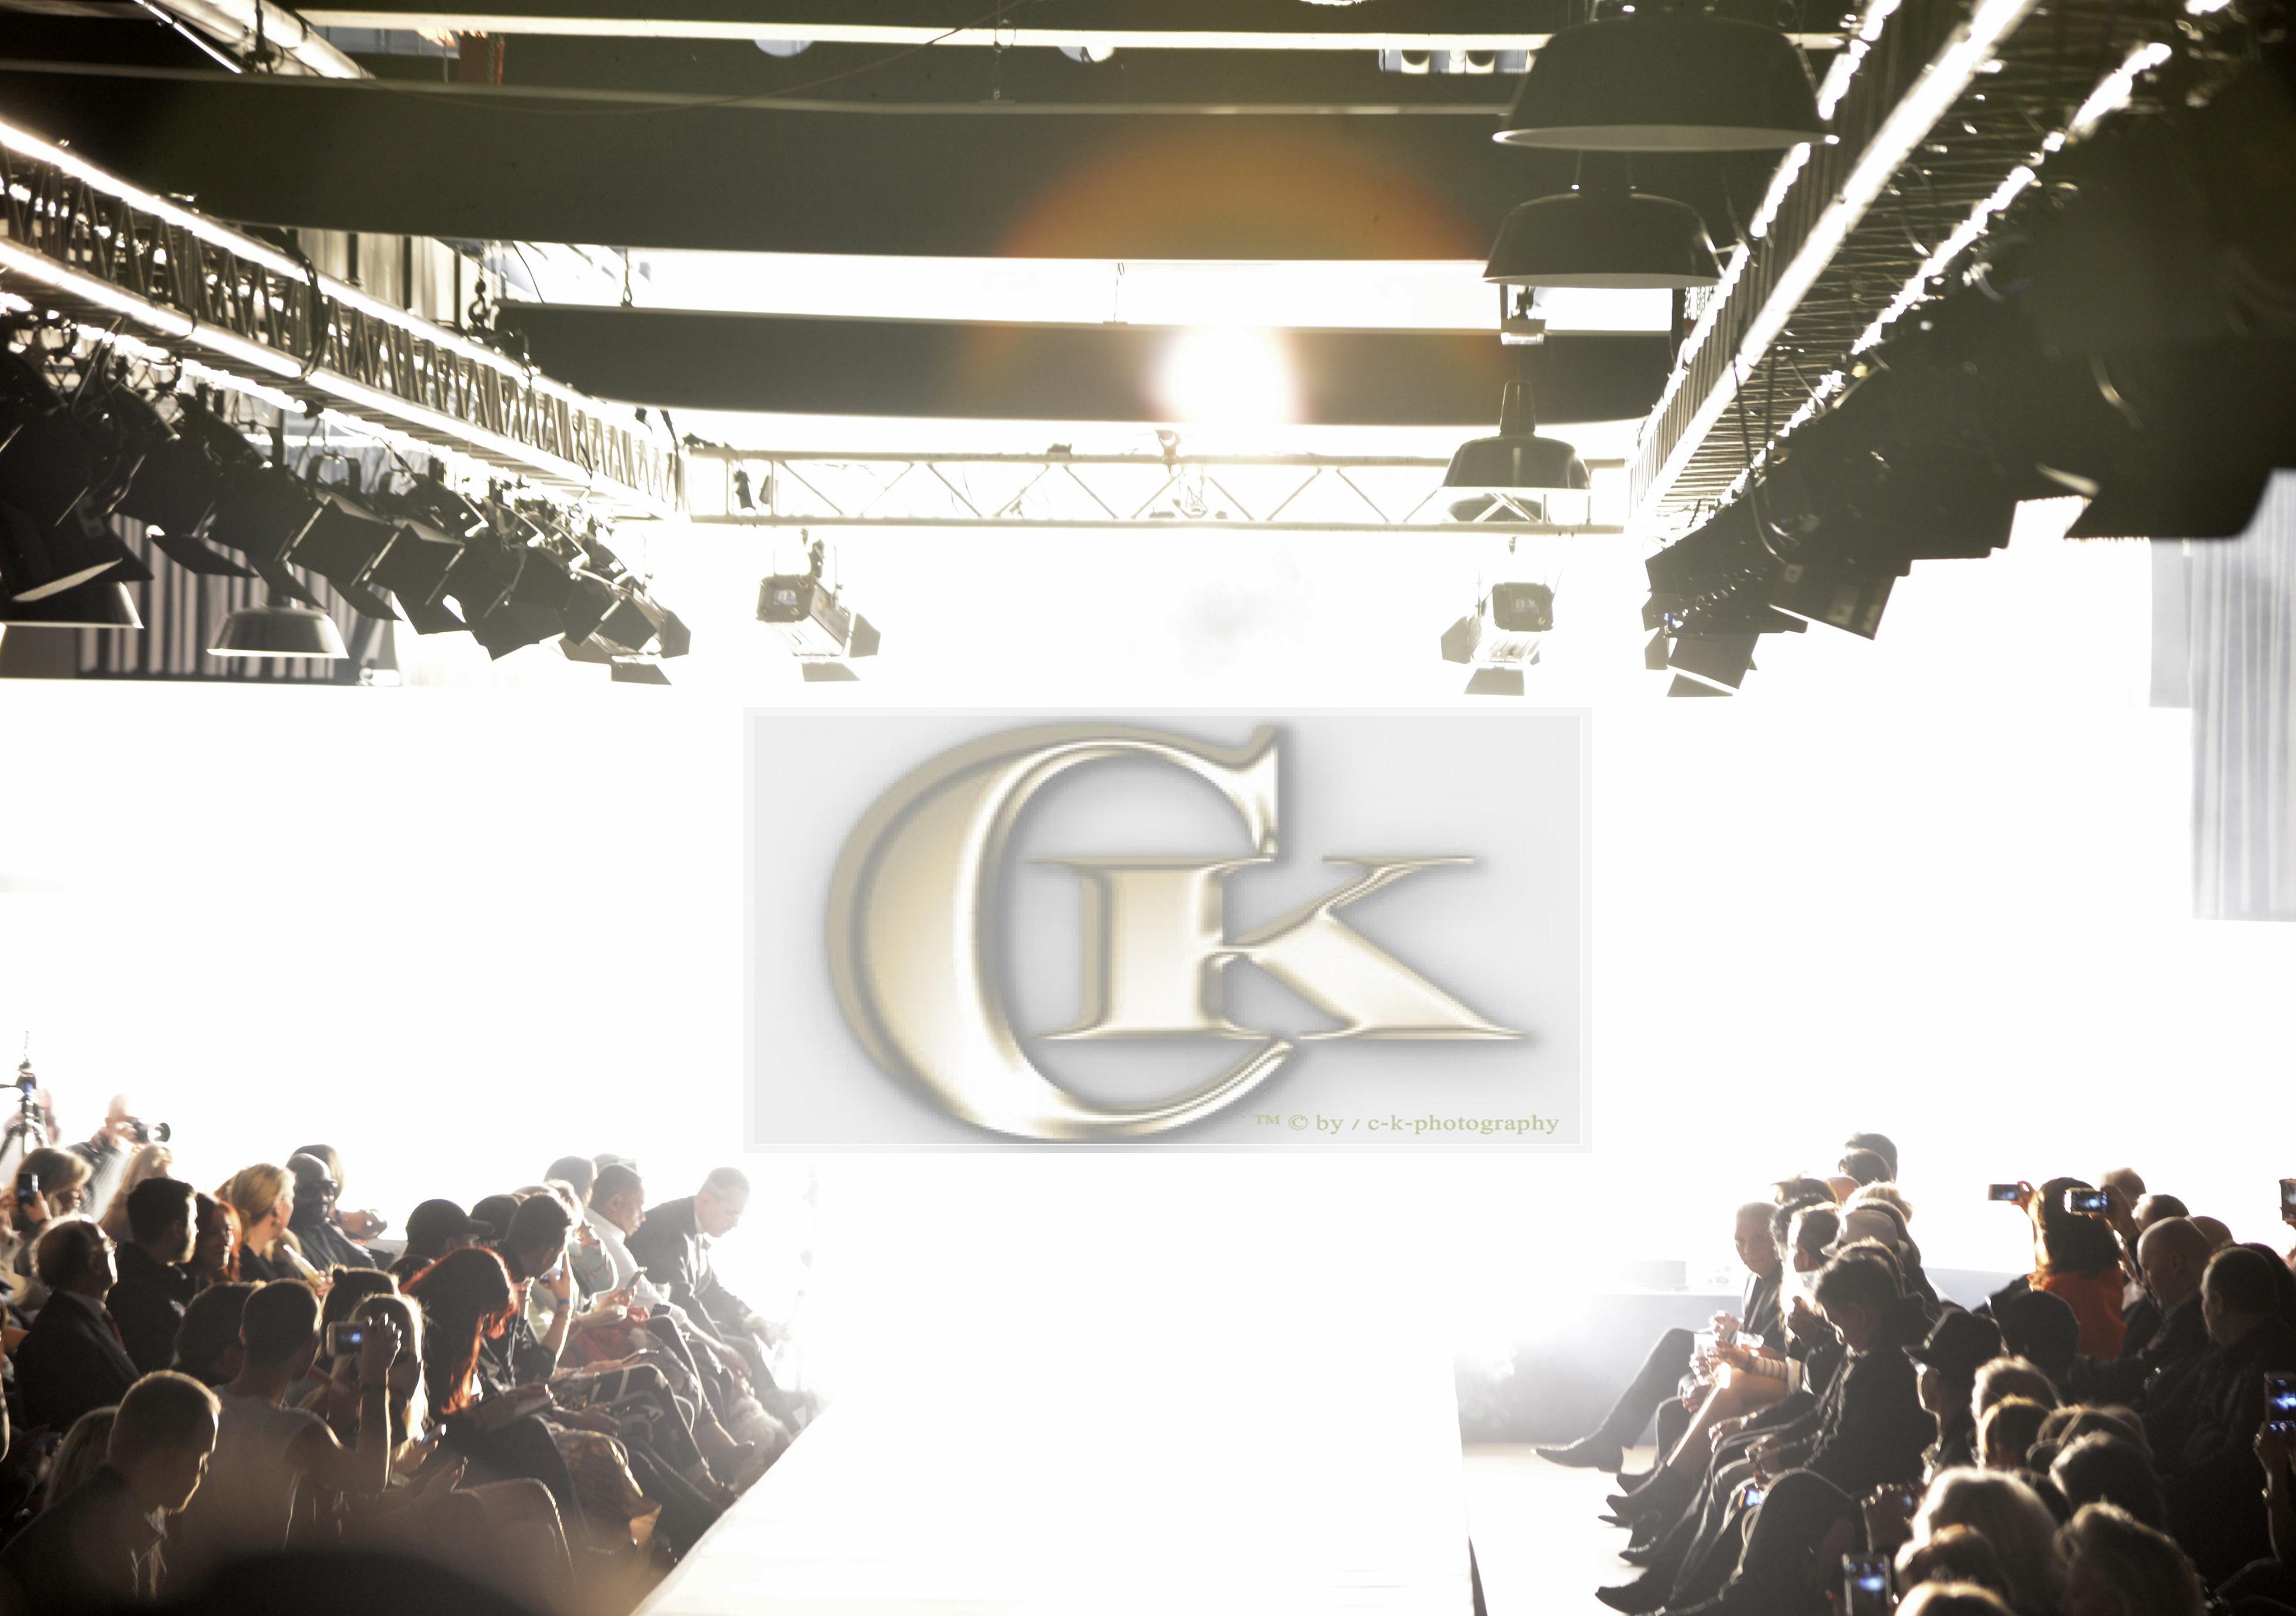 www.c-k-photography.com